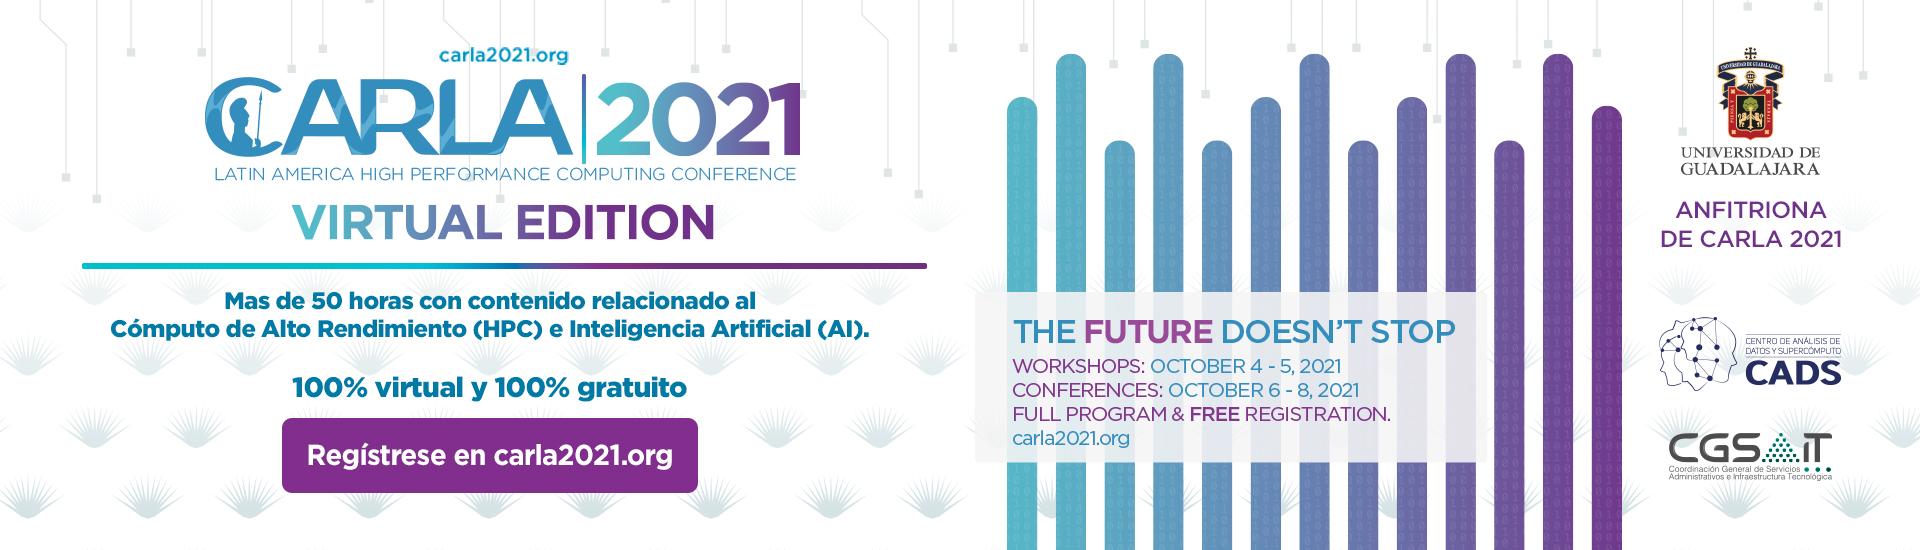 CARLA 2021- Del 4 al 8 de octubre. UDG INVITA